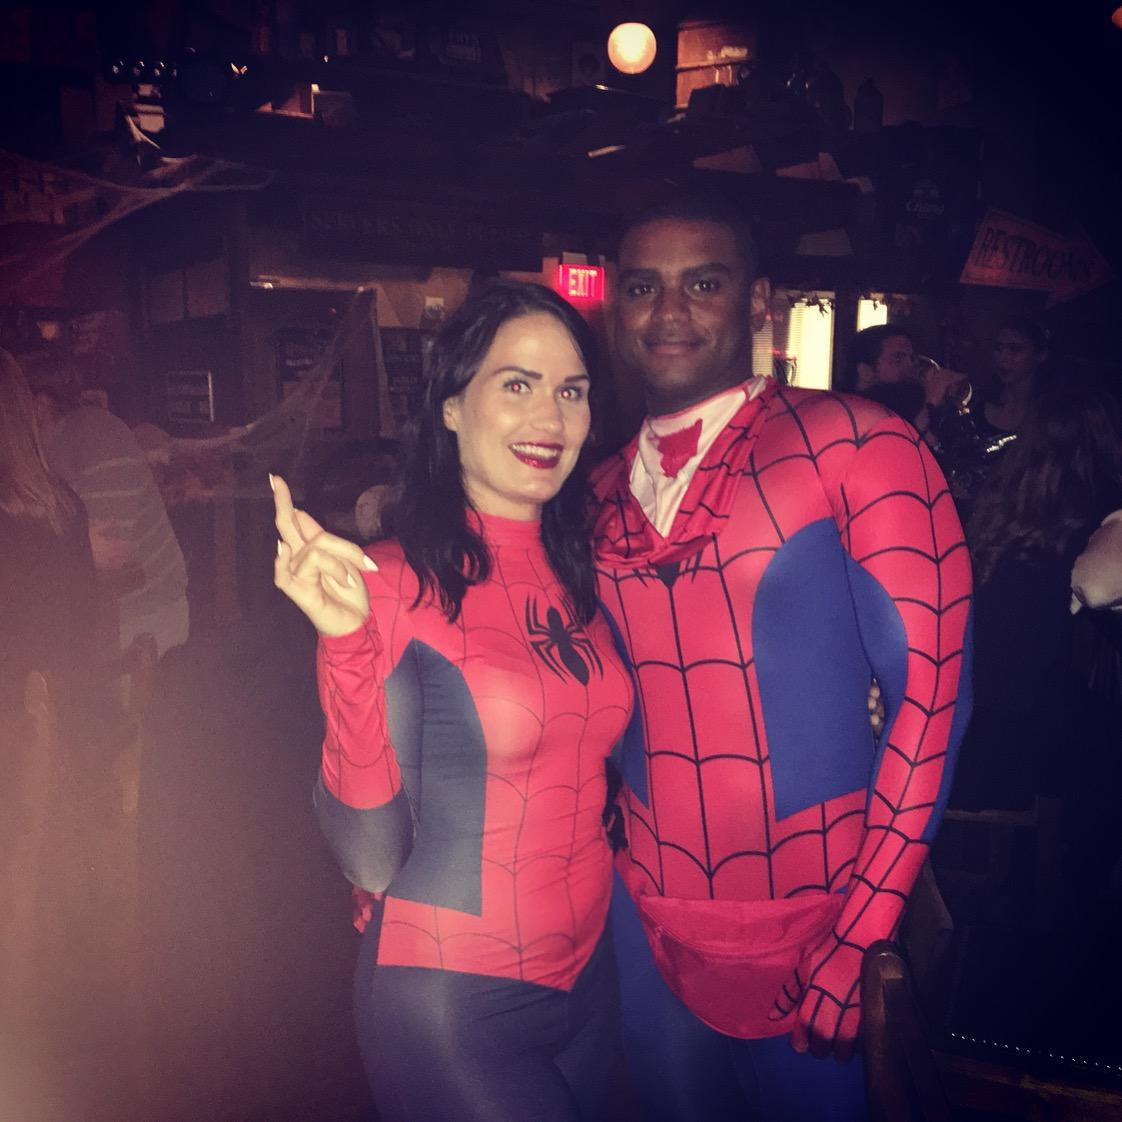 Spidermen Halloween